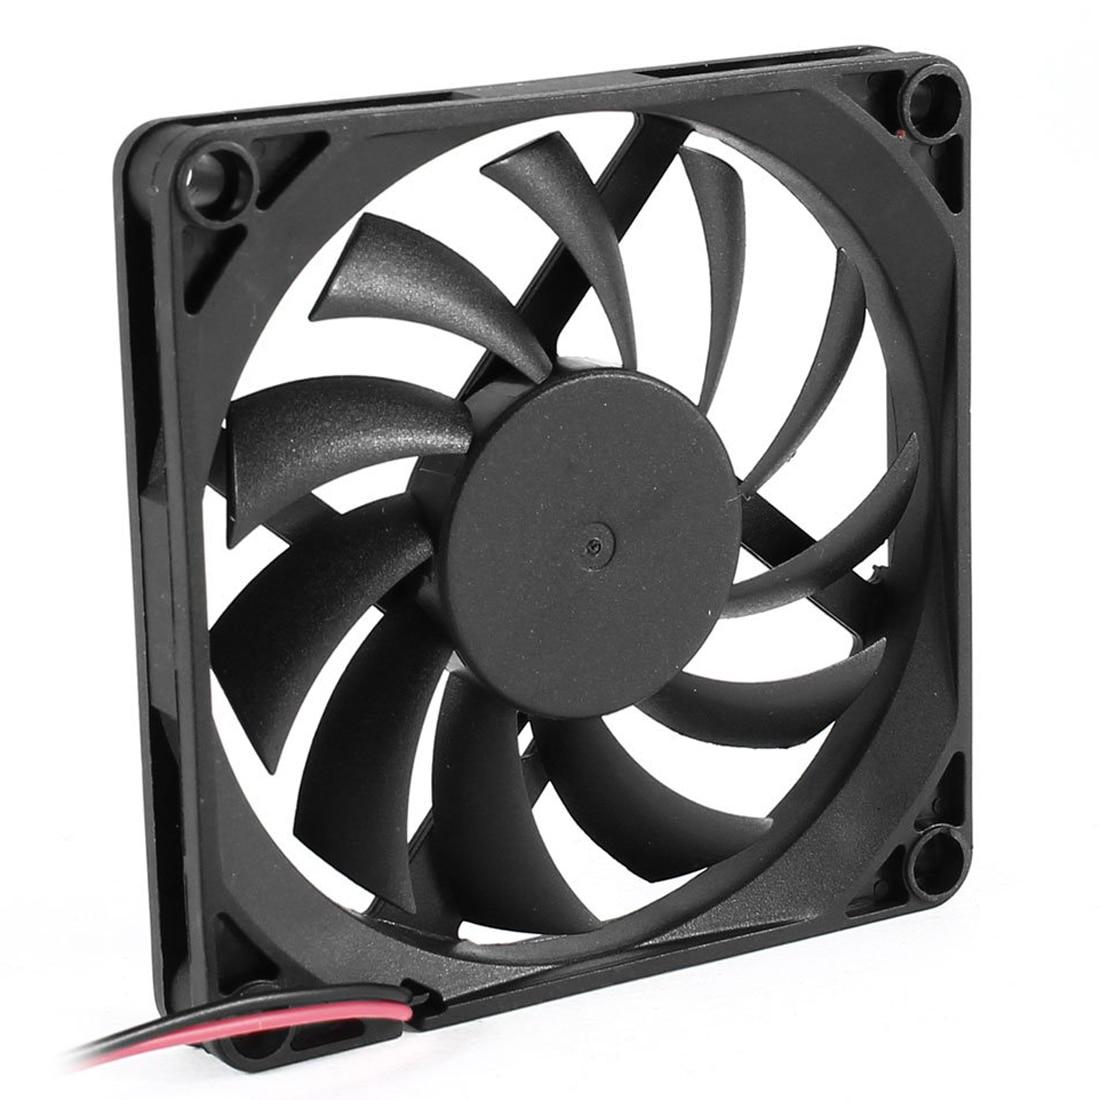 купить PROMOTION! Hot 80mm 2 Pin Connector Cooling Fan for Computer Case CPU Cooler Radiator по цене 66.76 рублей